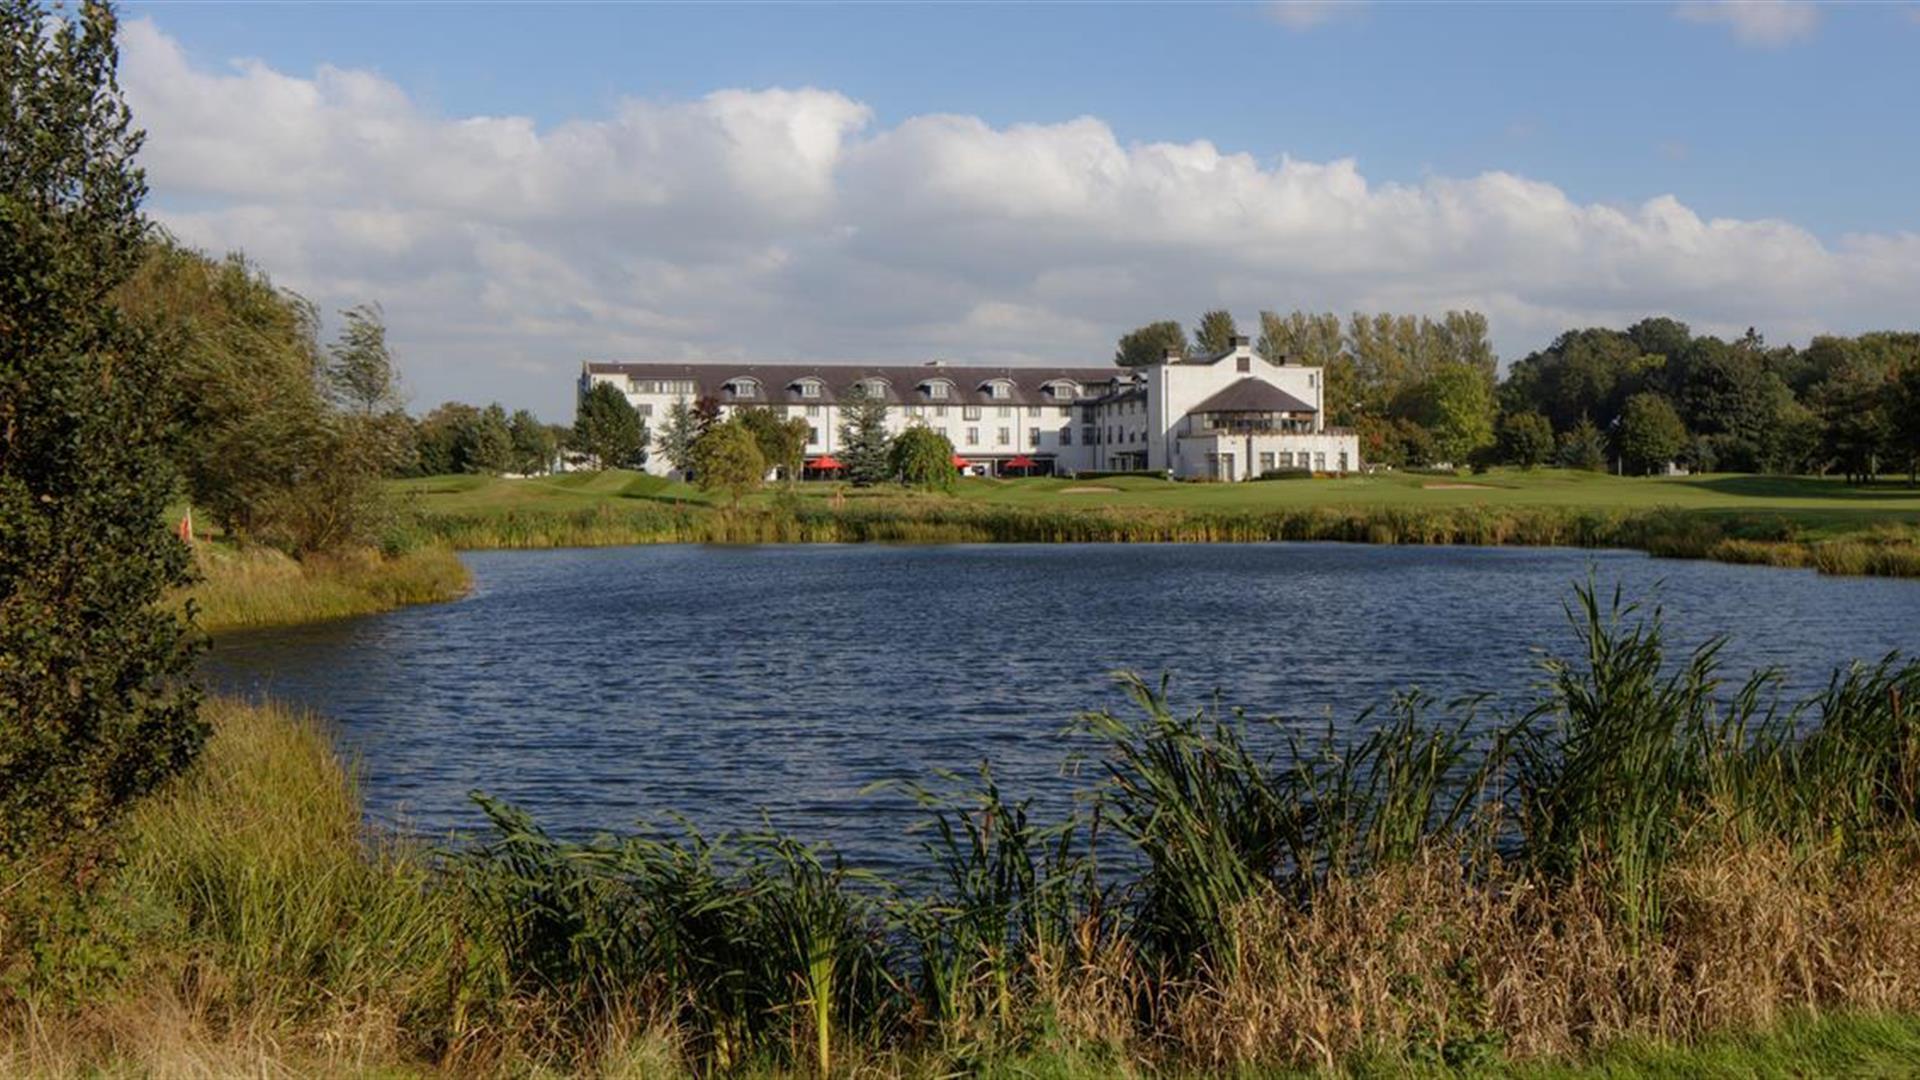 Hilton Templepatrick